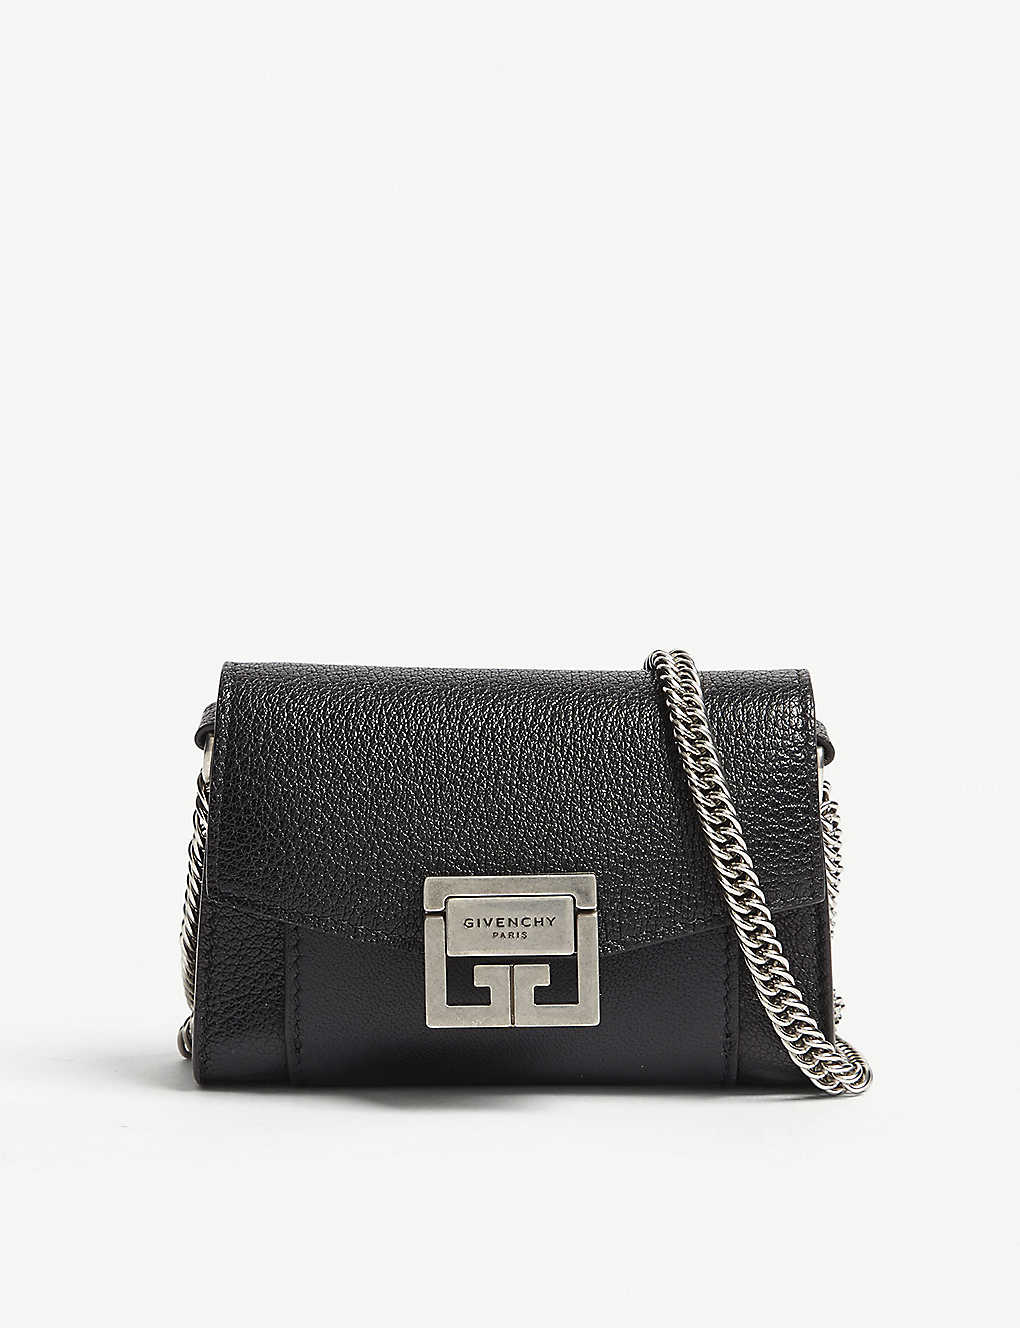 GIVENCHY - GV3 Nano leather belt bag  2f4a77dda67d5